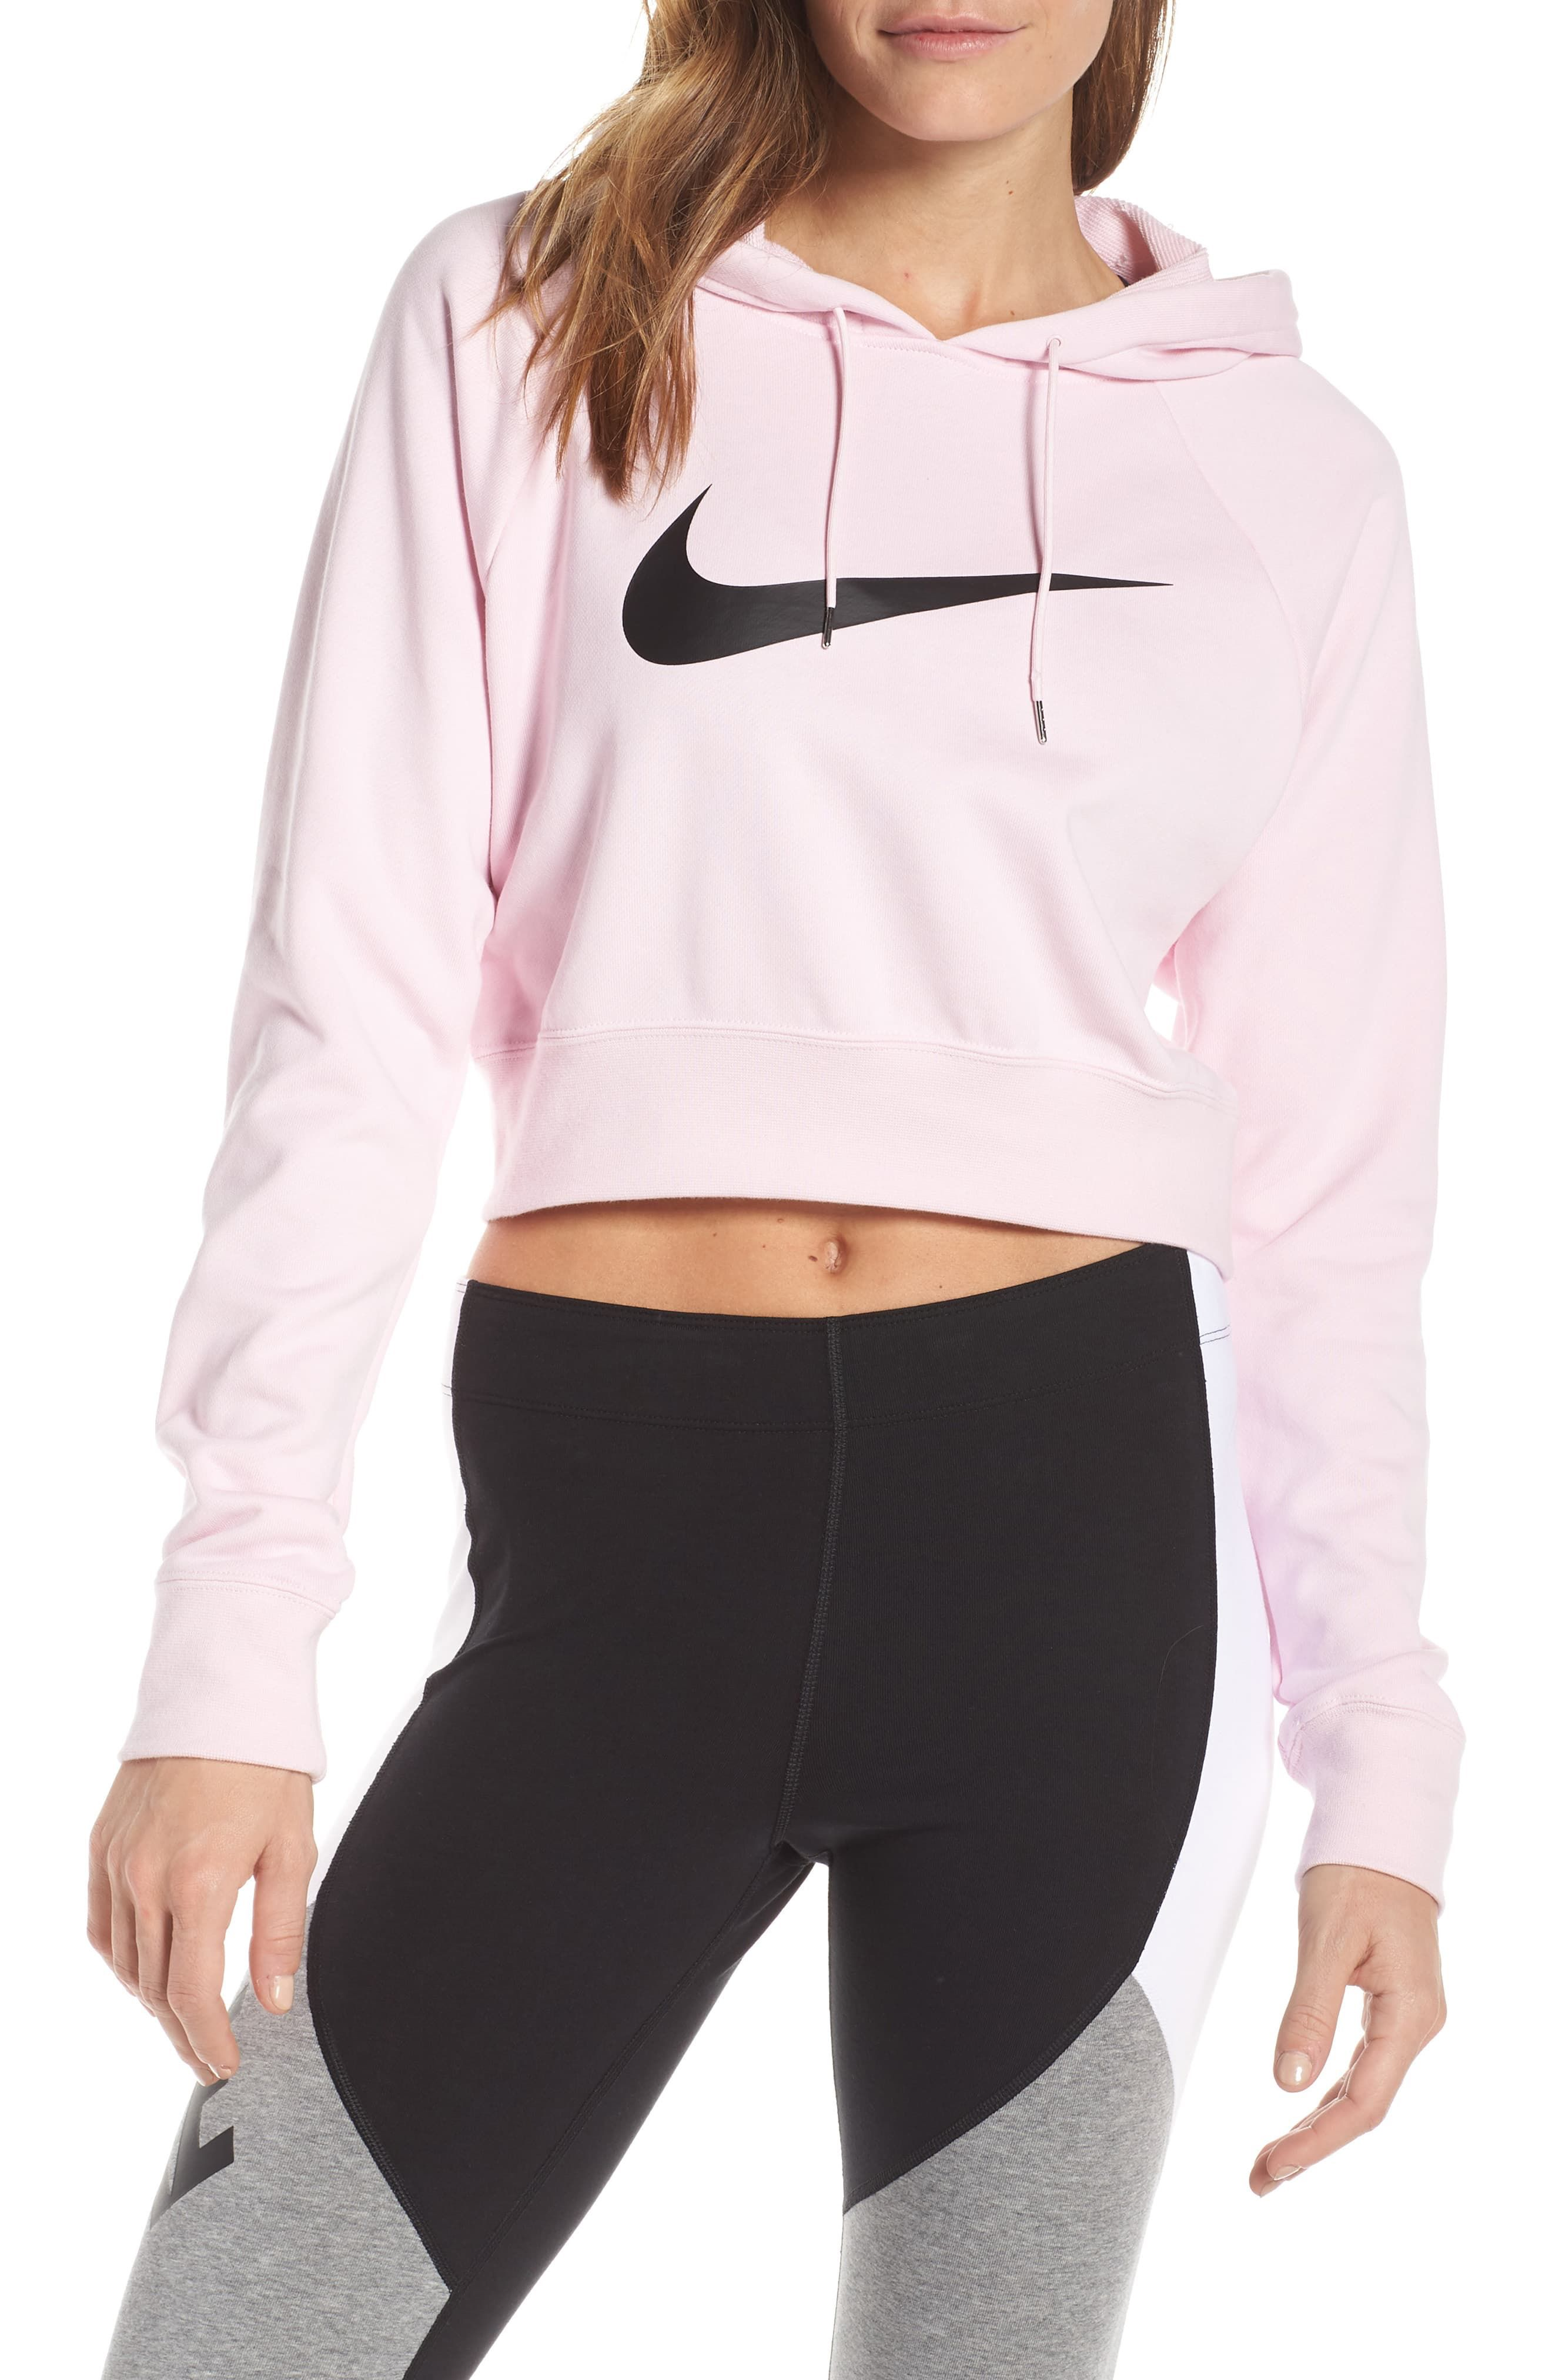 Nike Sportswear Women S Crop Hoodie Available At Nordstrom Nike Sportswear Women Nike Outfits Nike Cropped Hoodie [ 4048 x 2640 Pixel ]